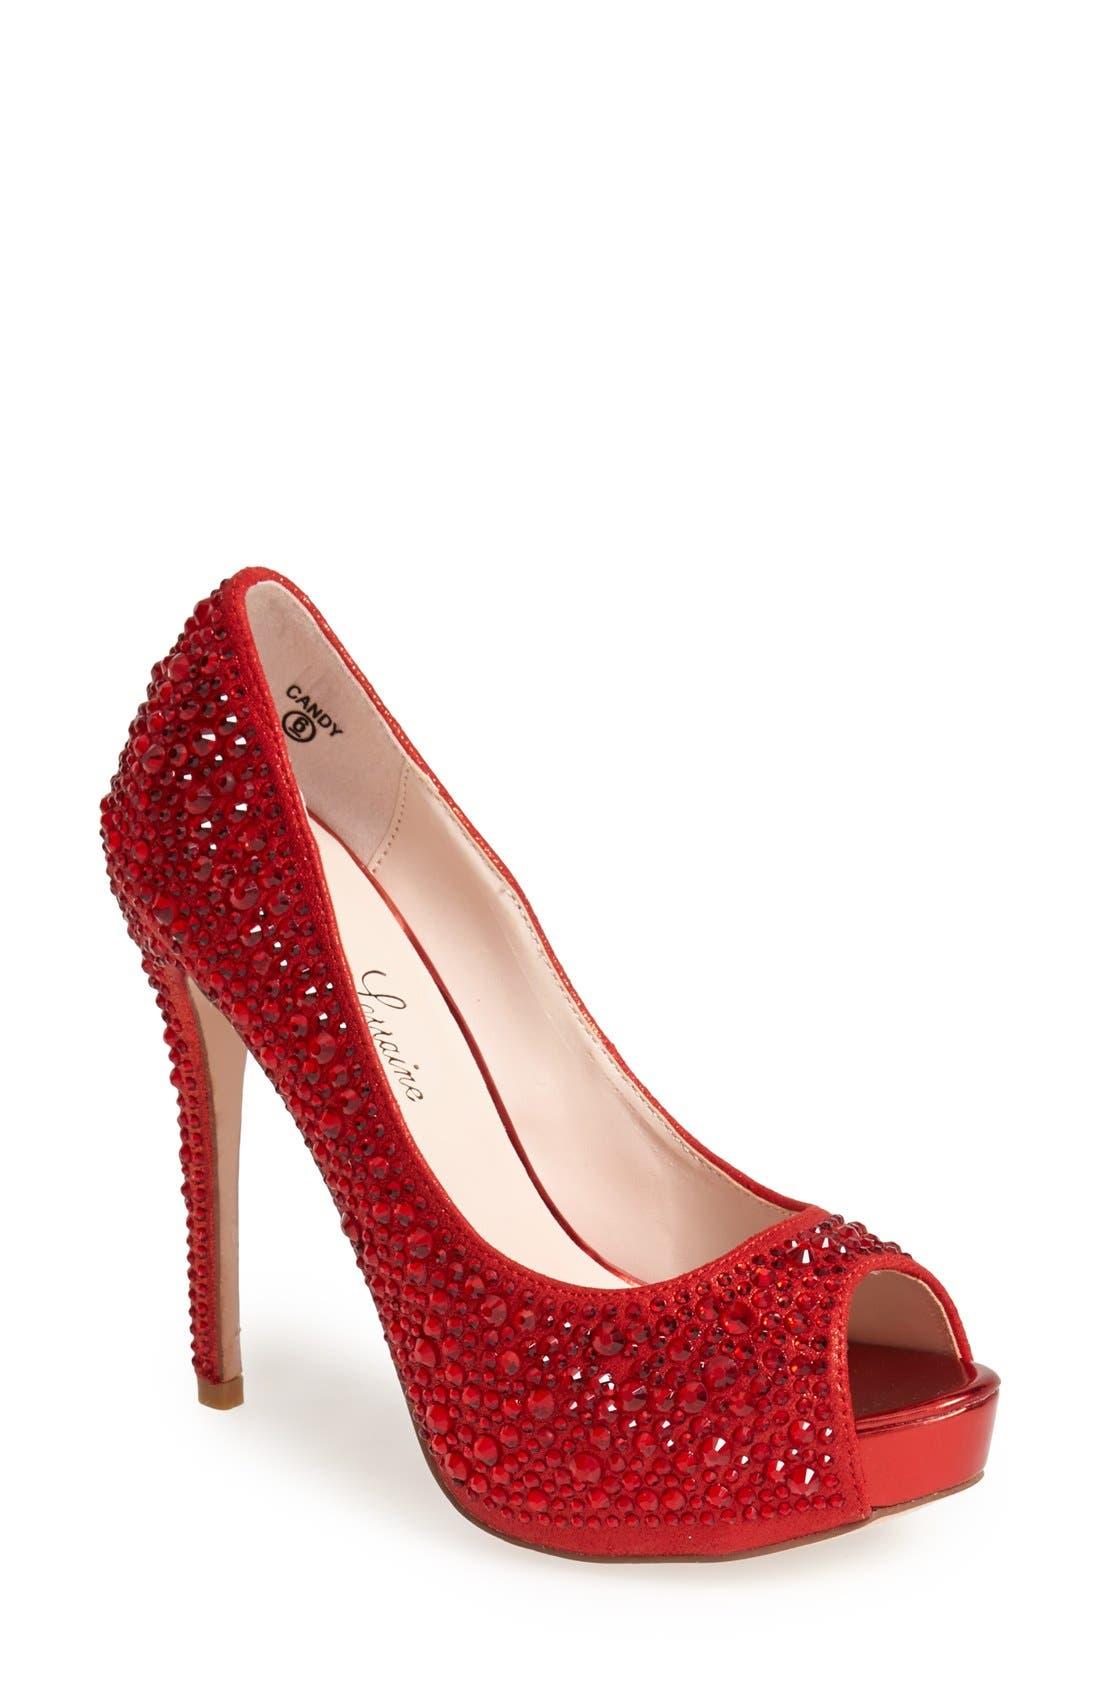 'Candy' Crystal Peep Toe Pump,                             Main thumbnail 1, color,                             Red